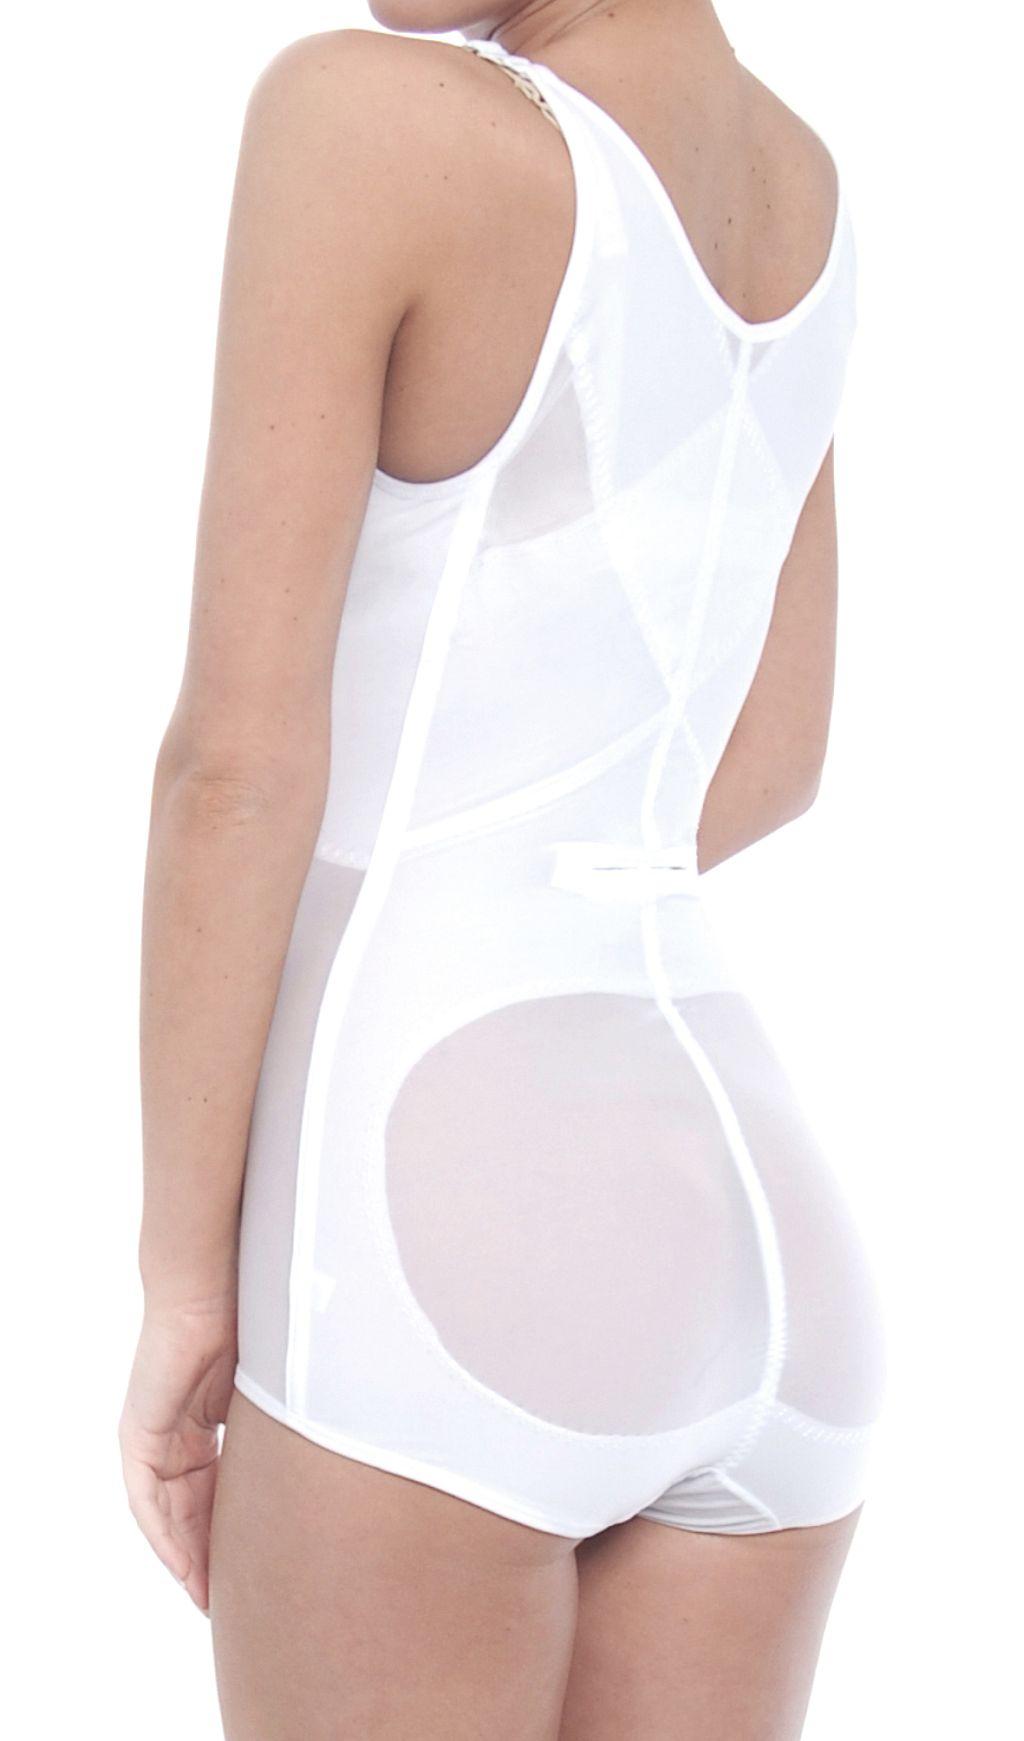 Damen Miederbody Mieder Shapewear Sommer Body Korselett 3003 weiß 36-42